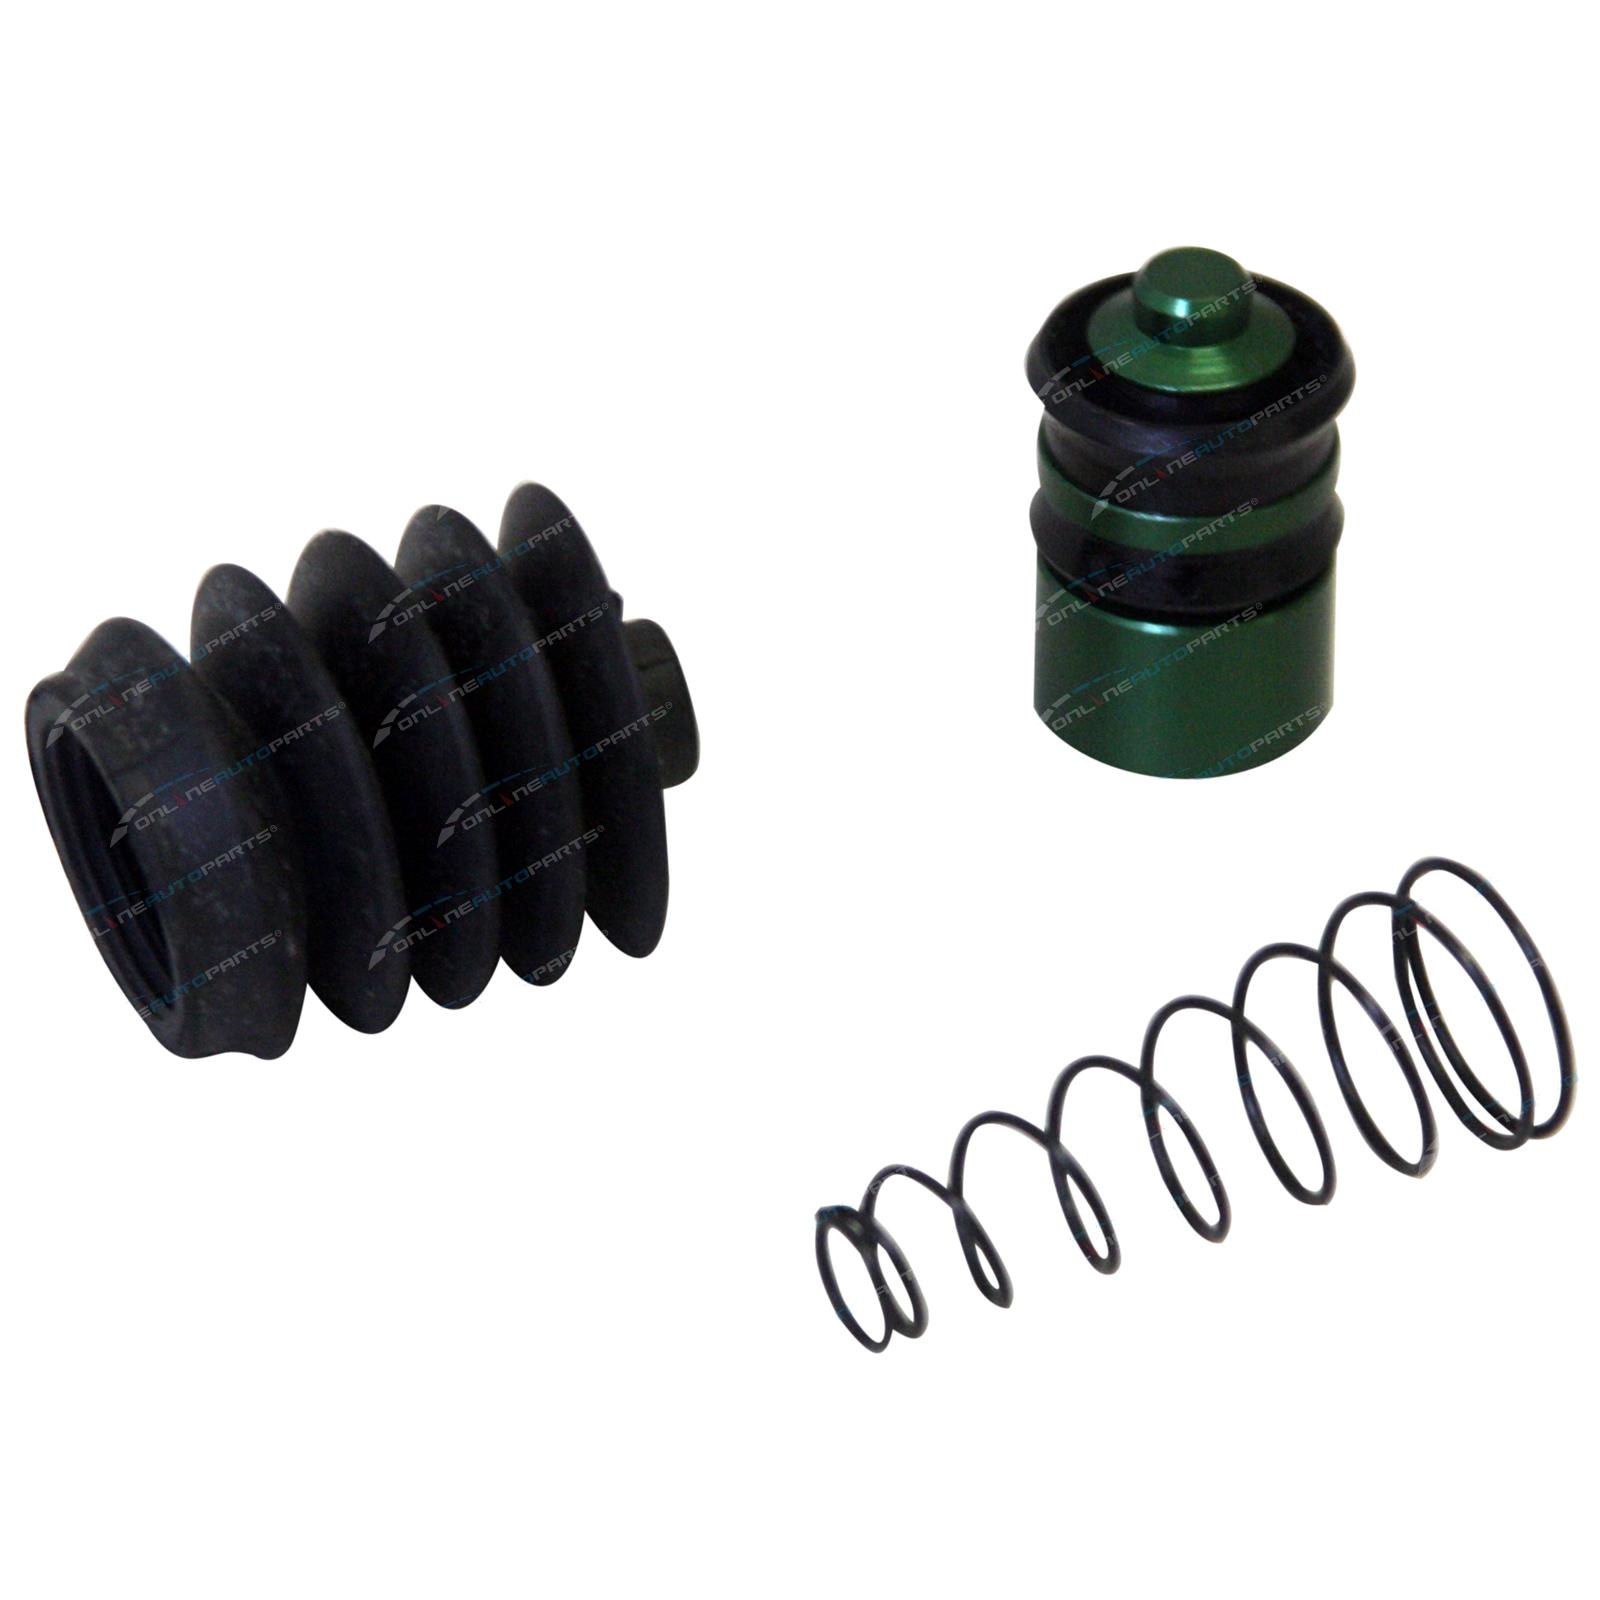 Clutch Slave Cylinder Repair Kit FIC - Japan